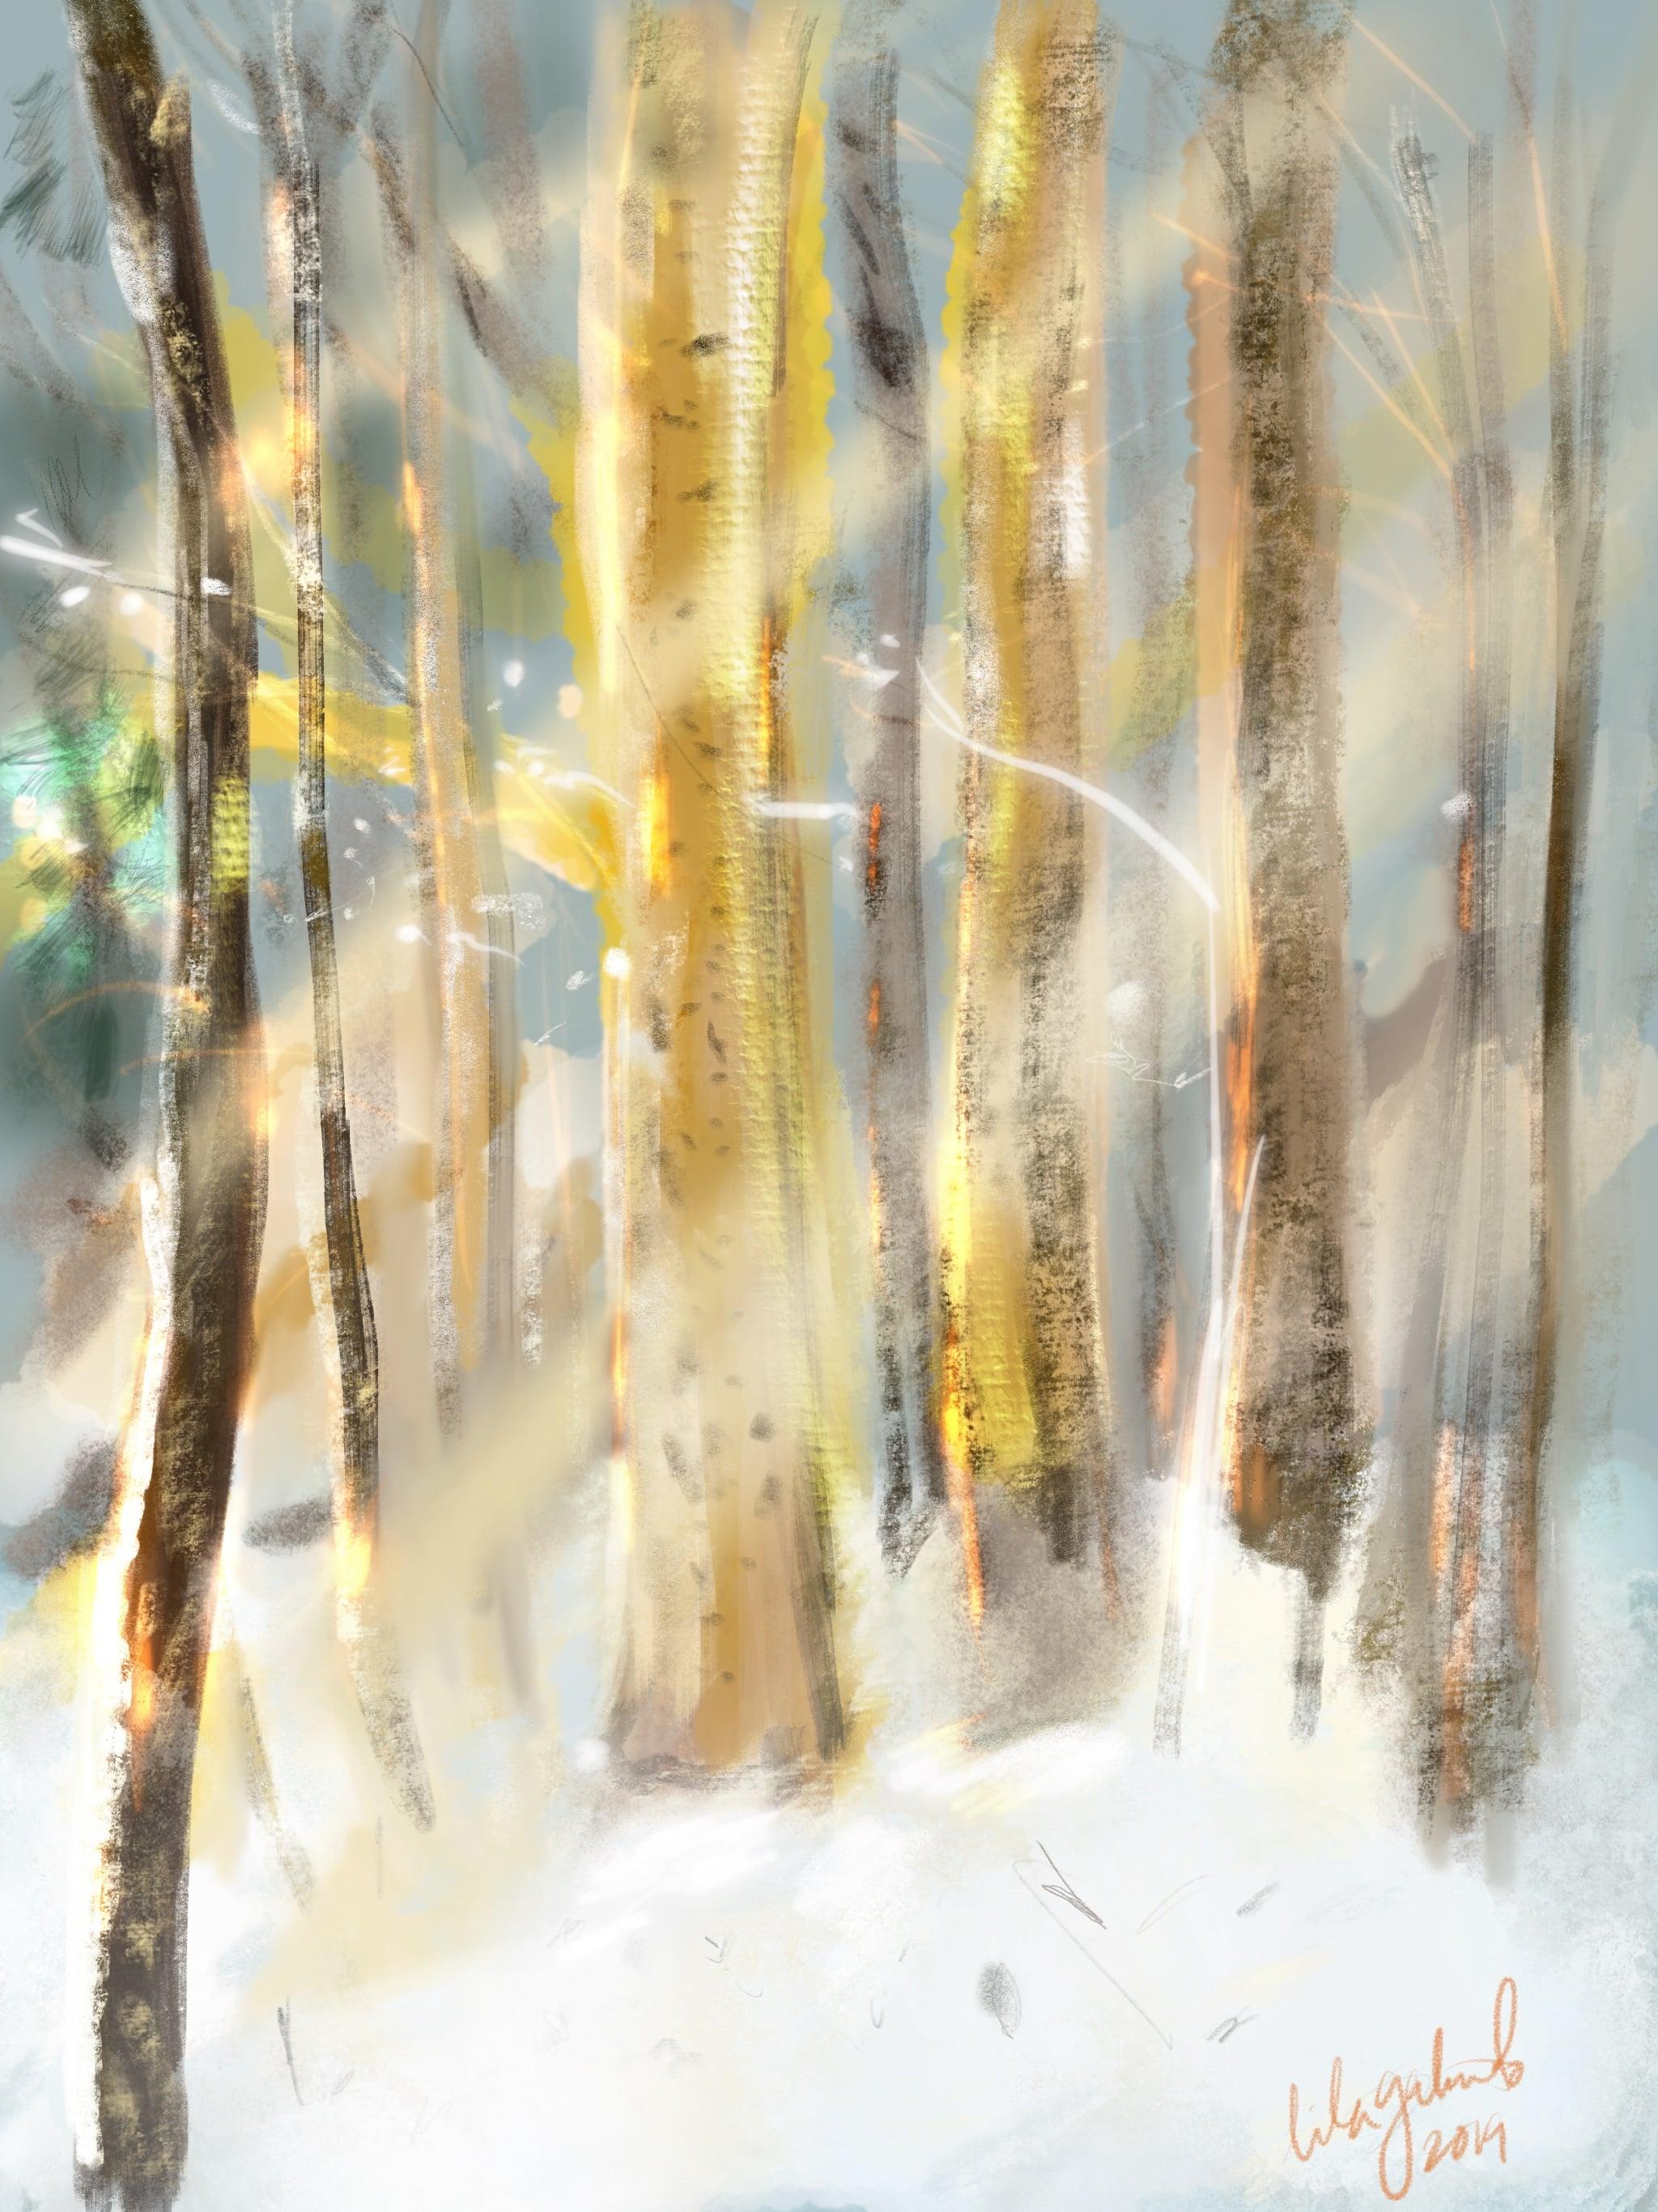 2019-jan-winter-trees.jpg